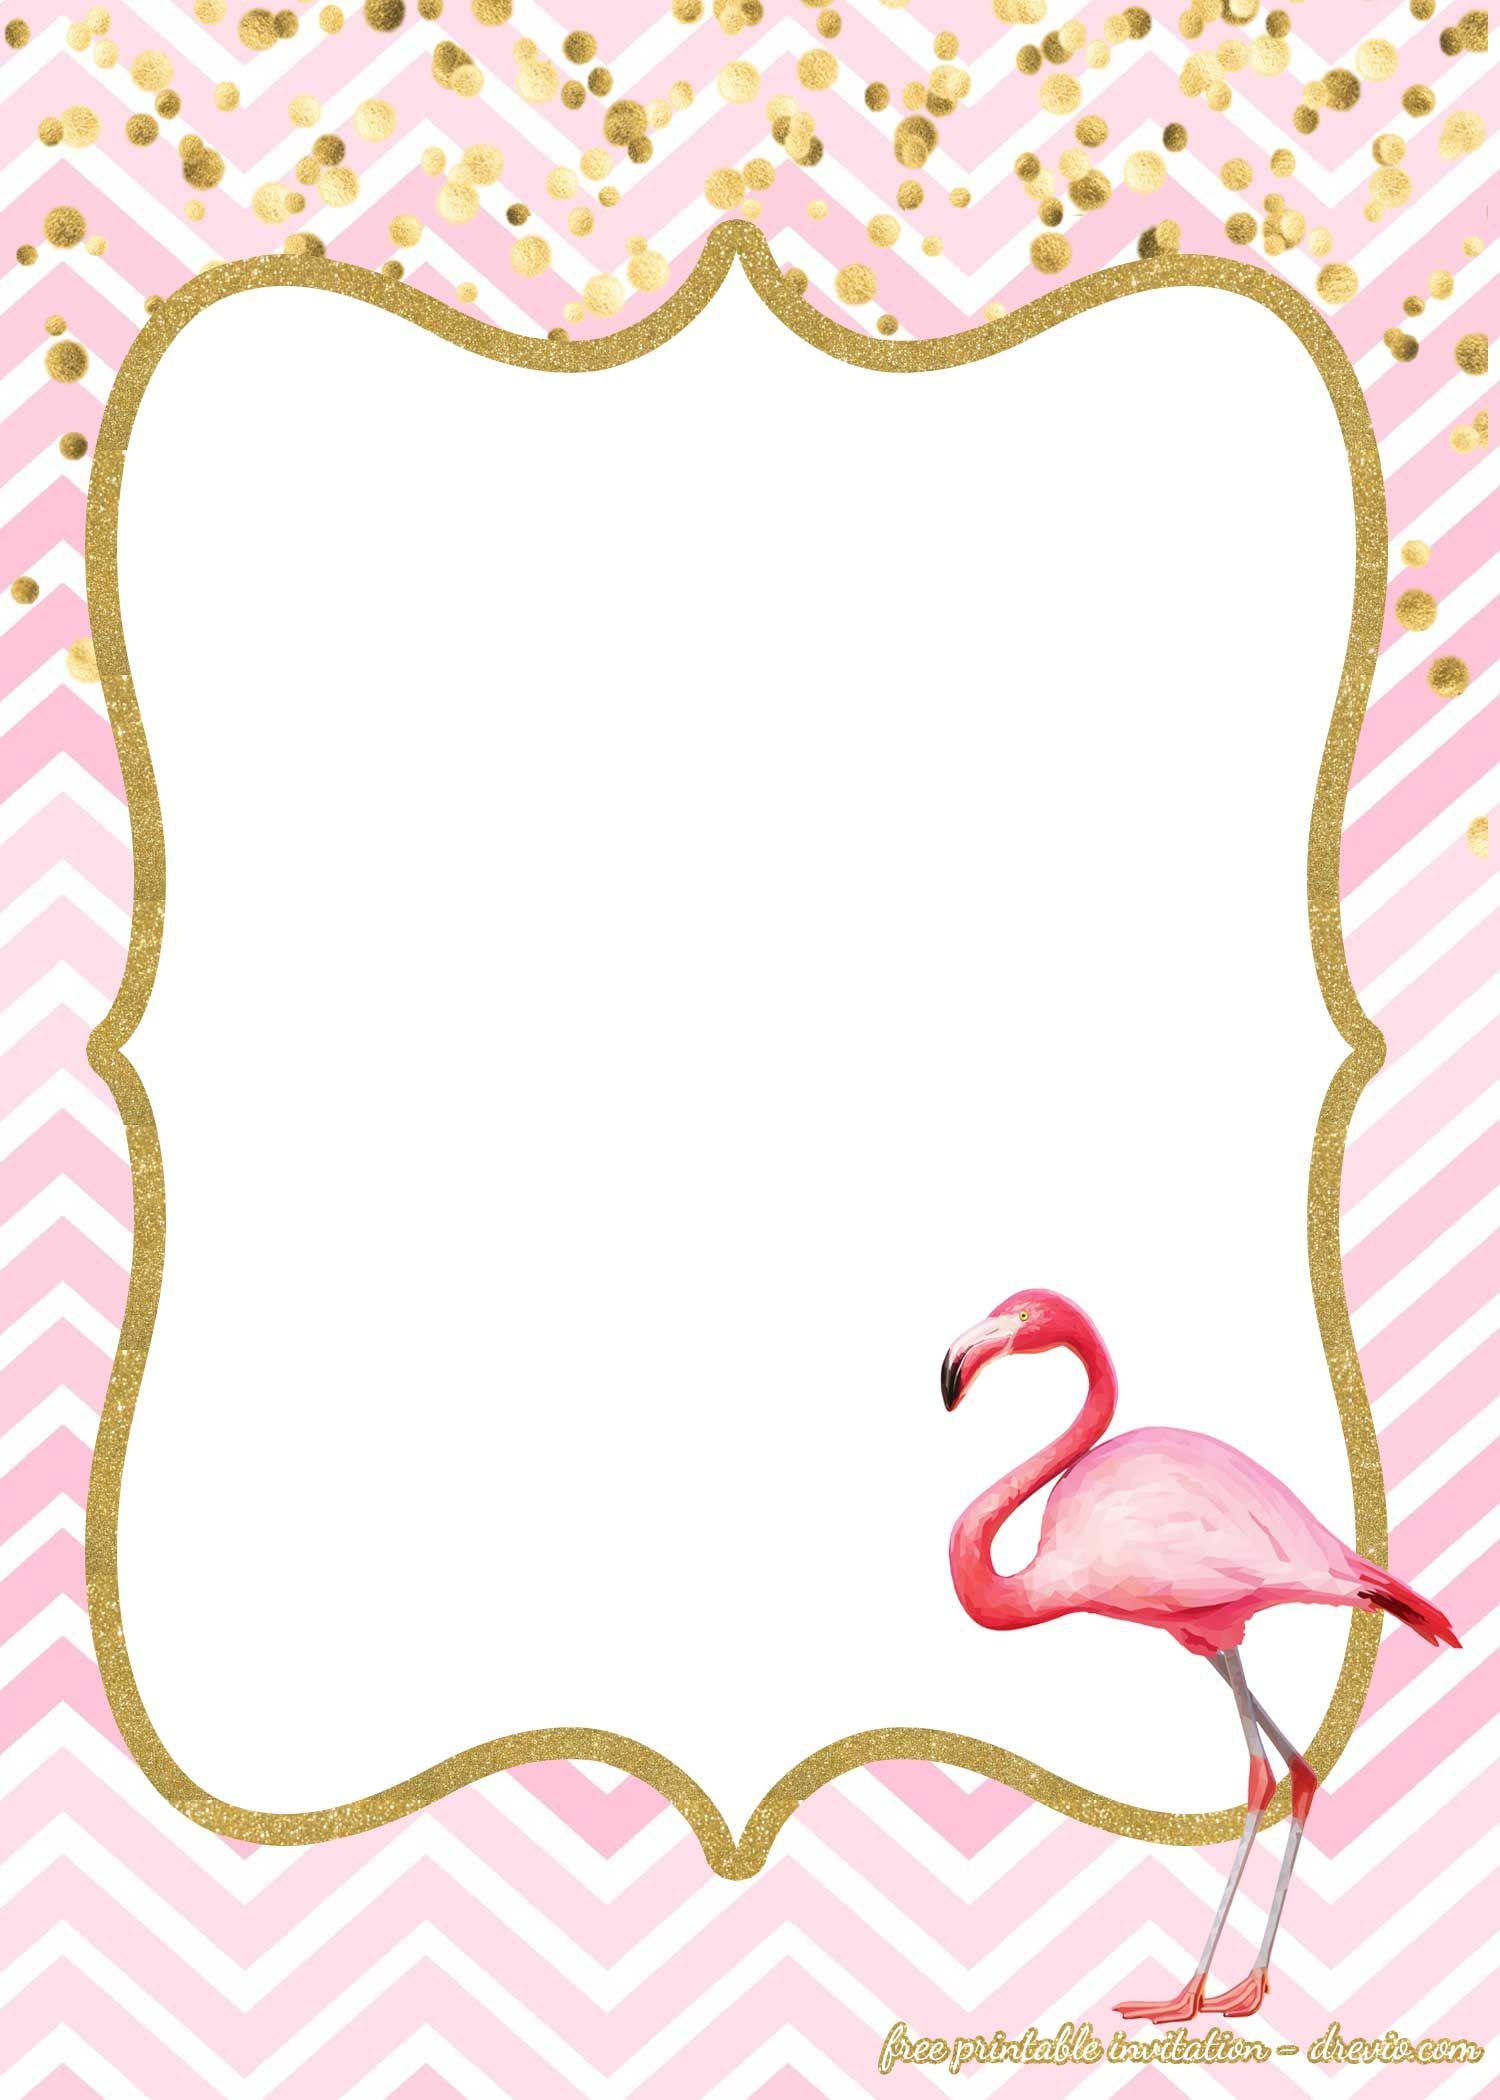 Flamingo border clipart. Free invitations templates first